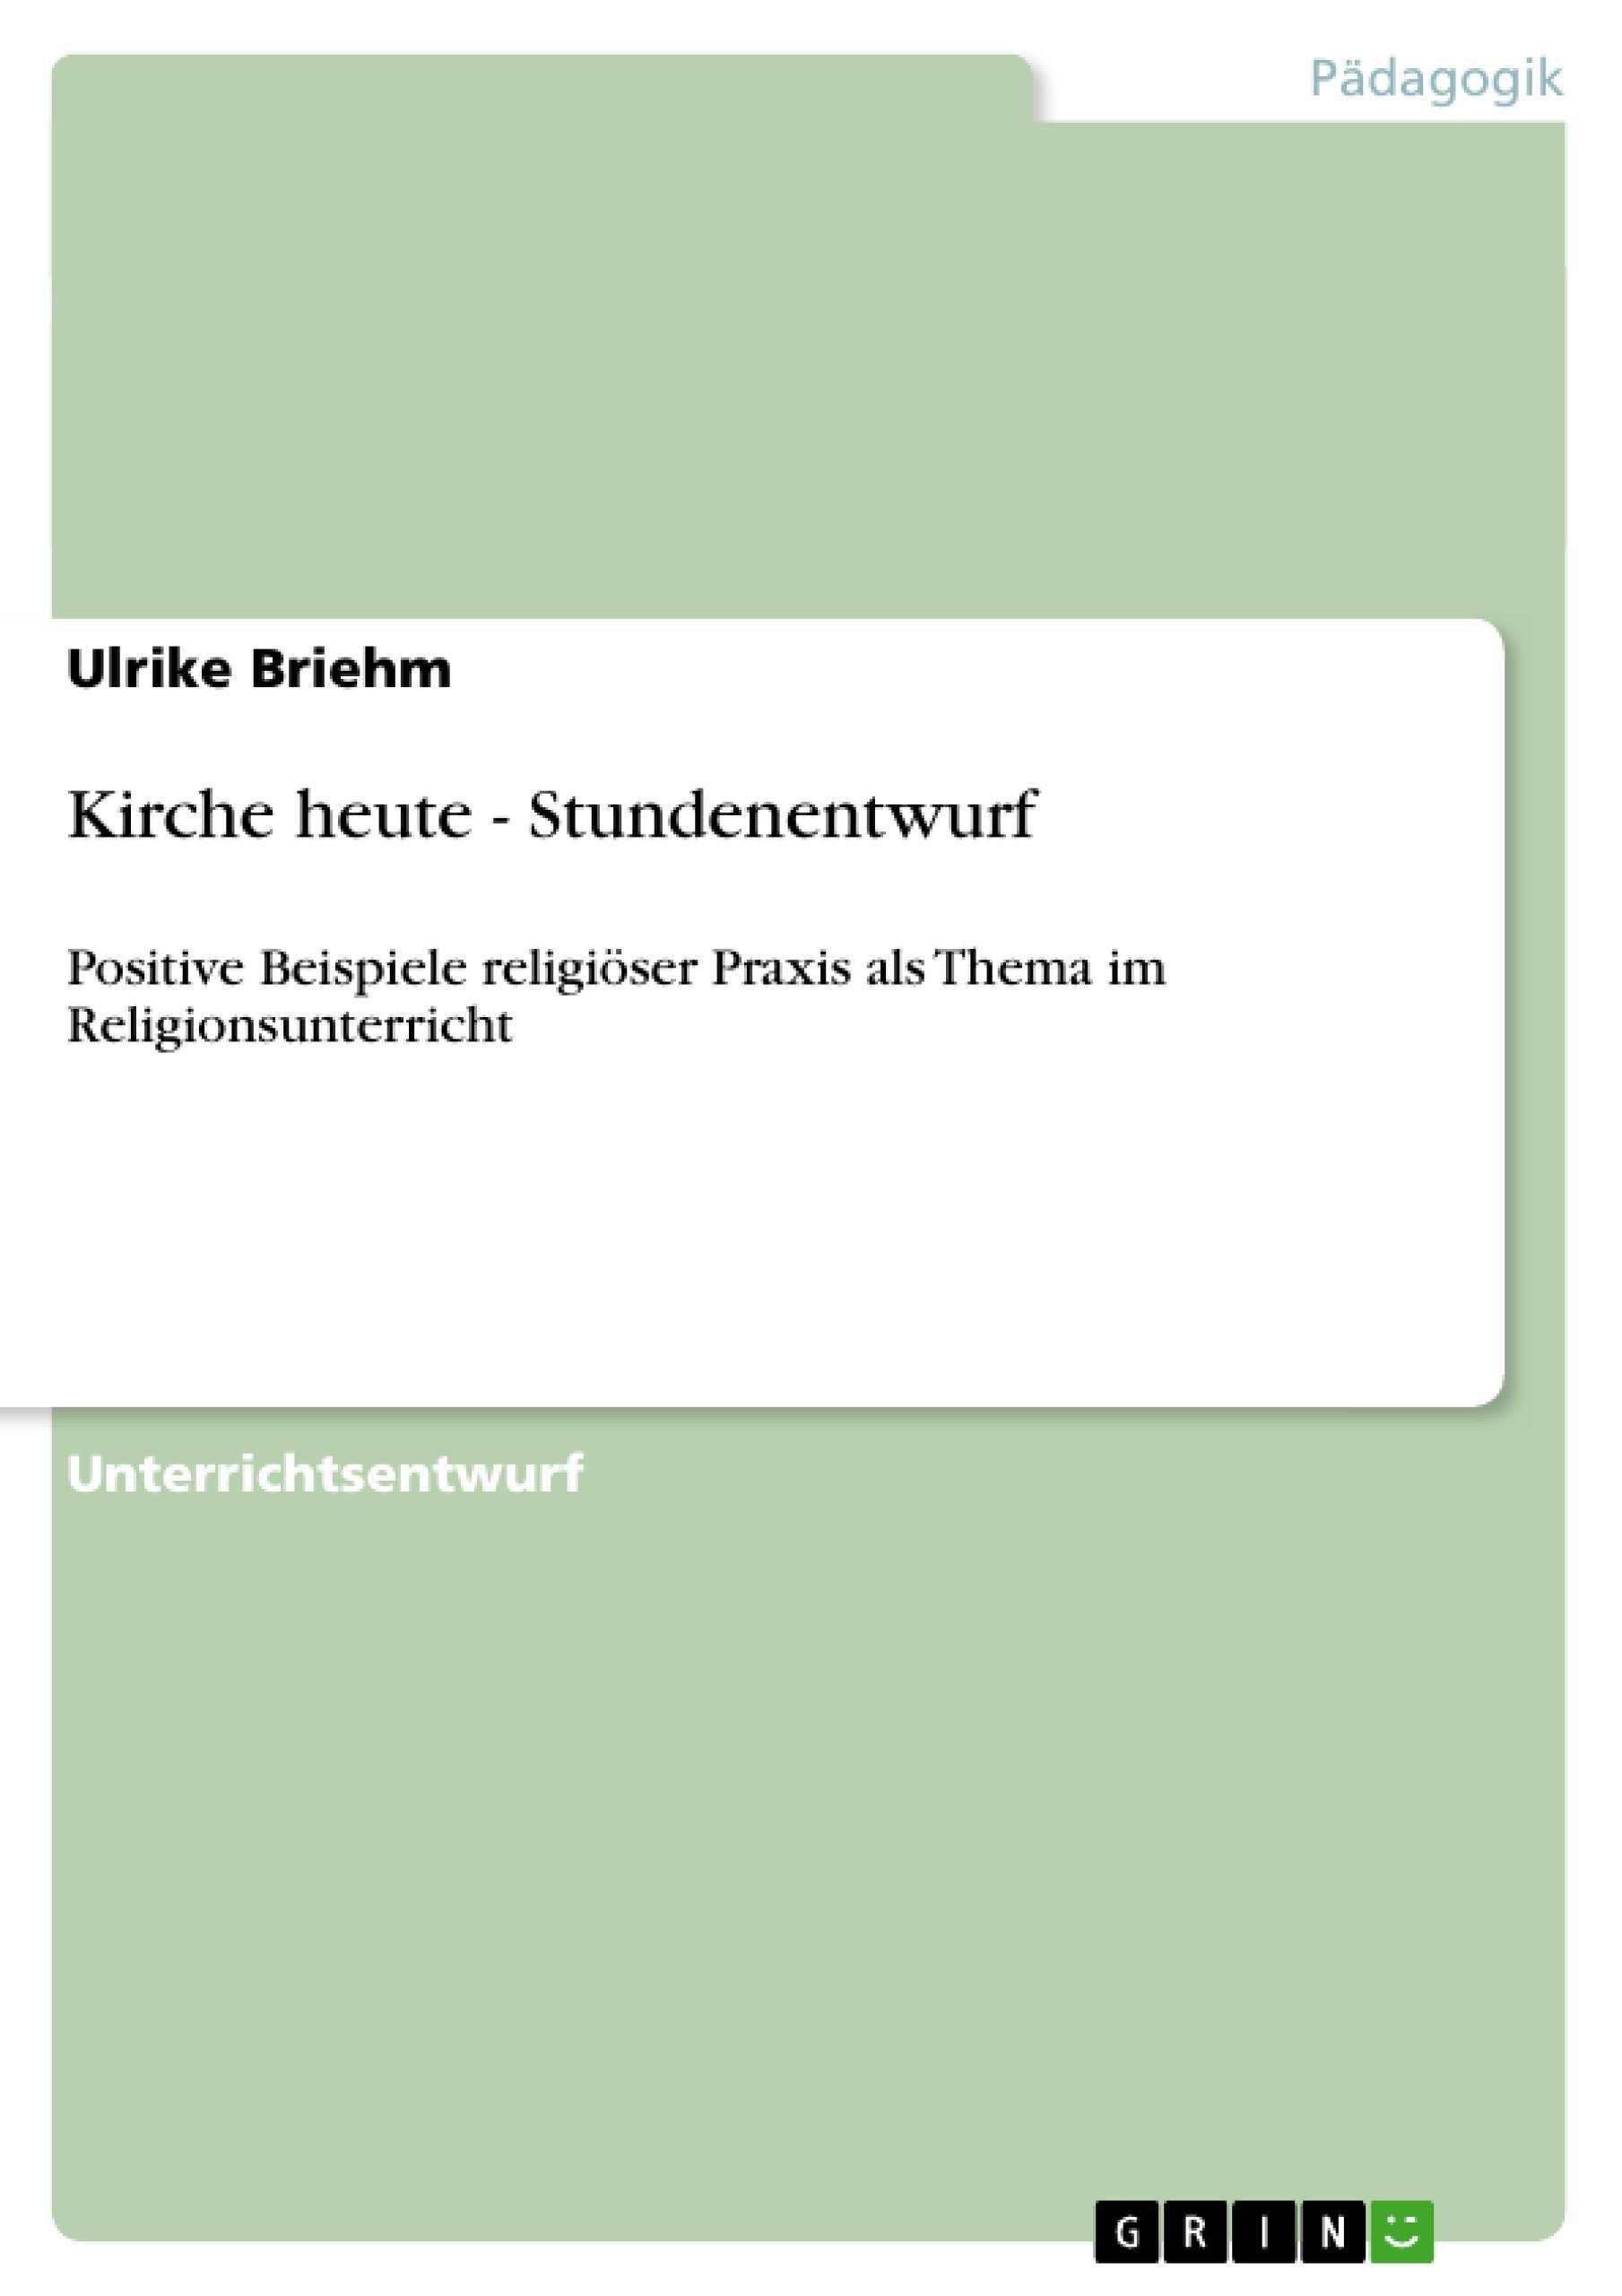 Kirche heute - Stundenentwurf Ulrike Briehm